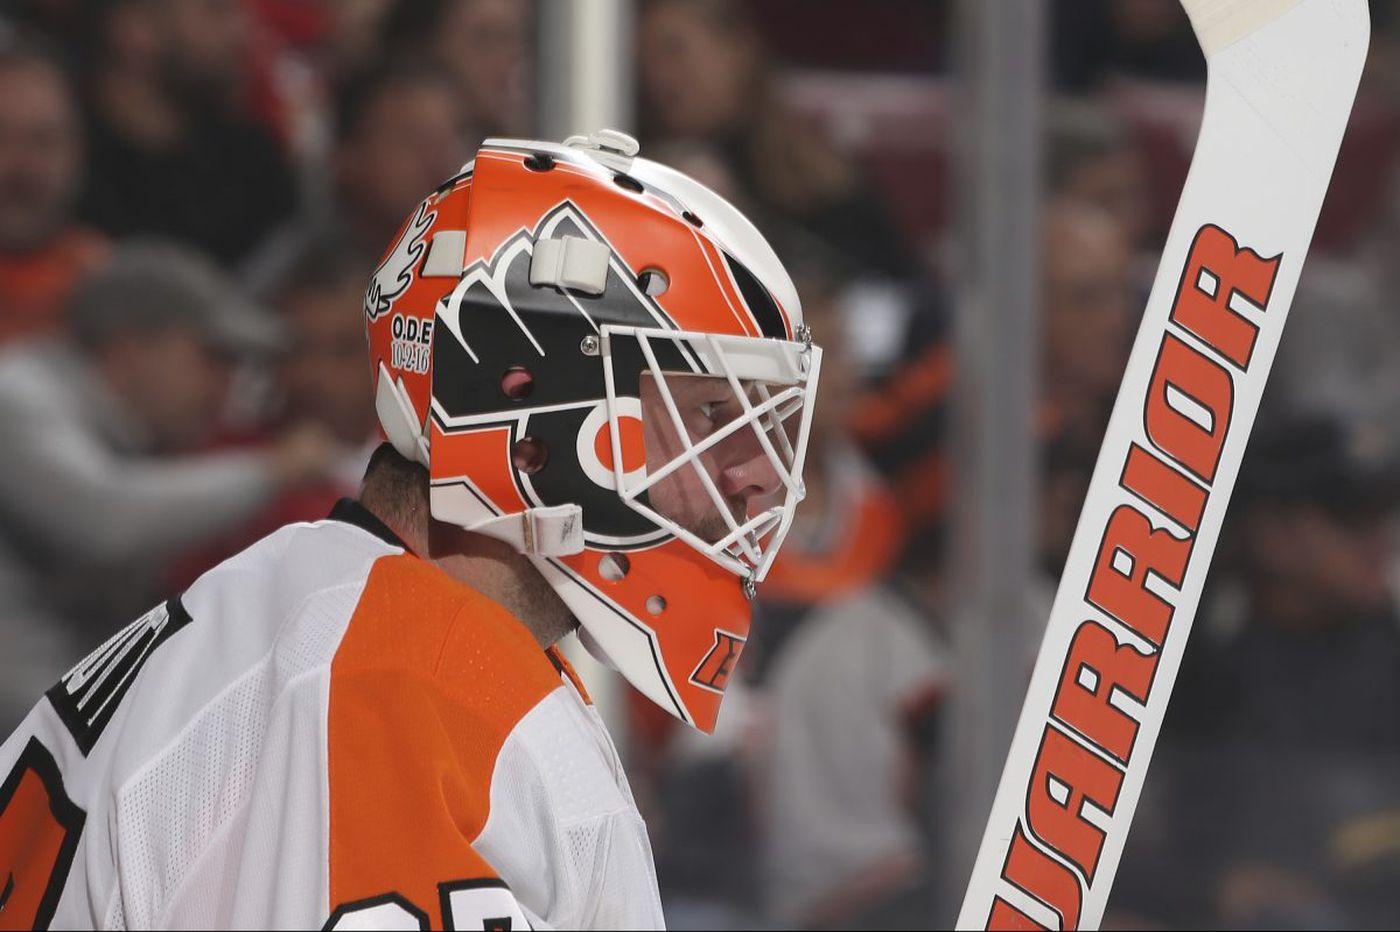 Key to Flyers' second half: Better starts